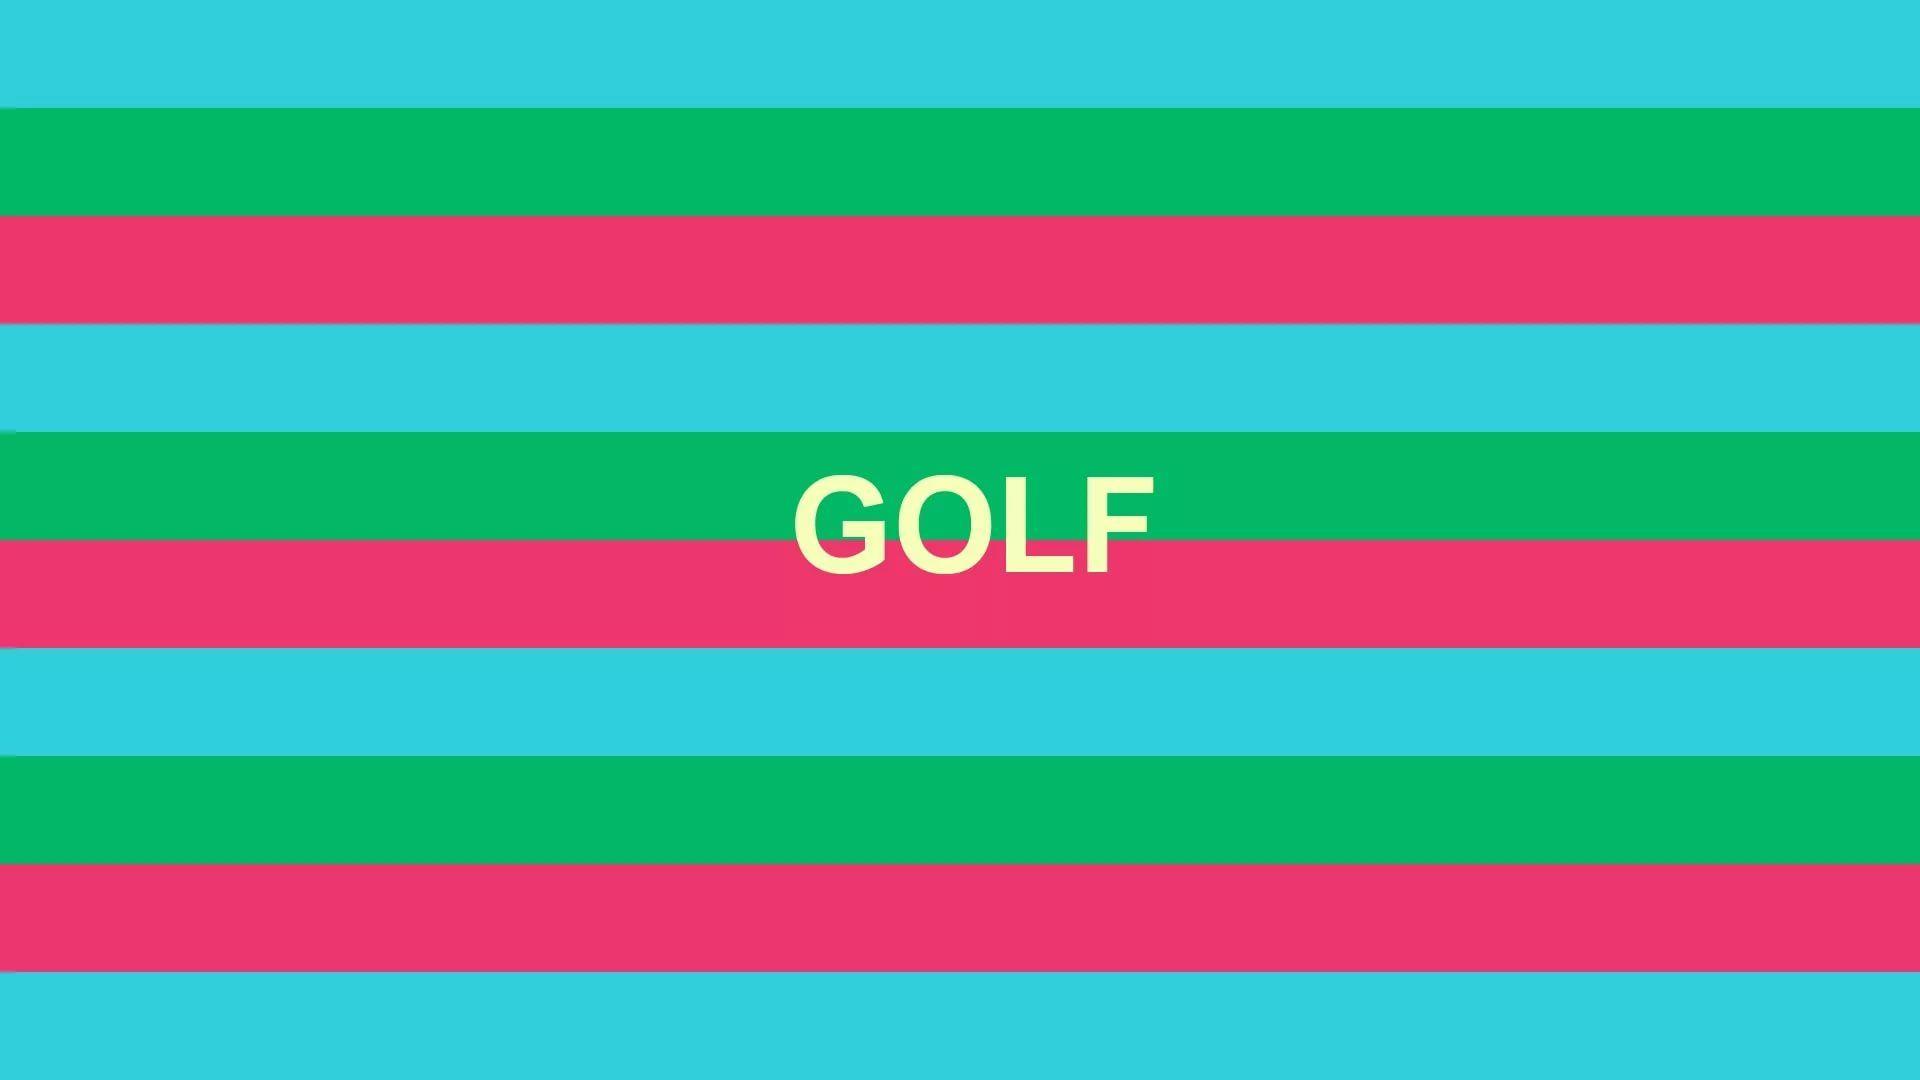 Golf Wang download free wallpaper image search